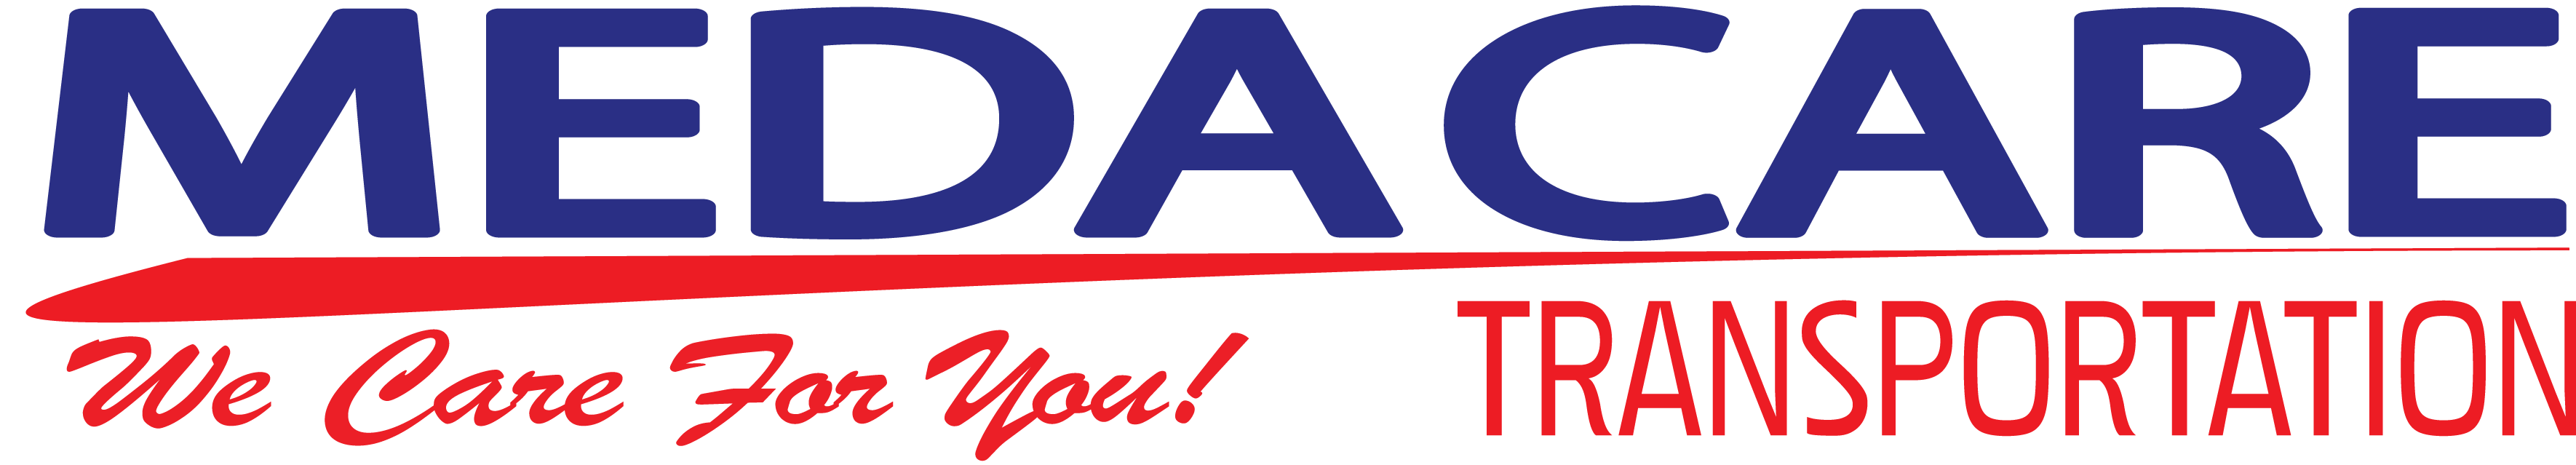 Meda-Care Transportation Inc